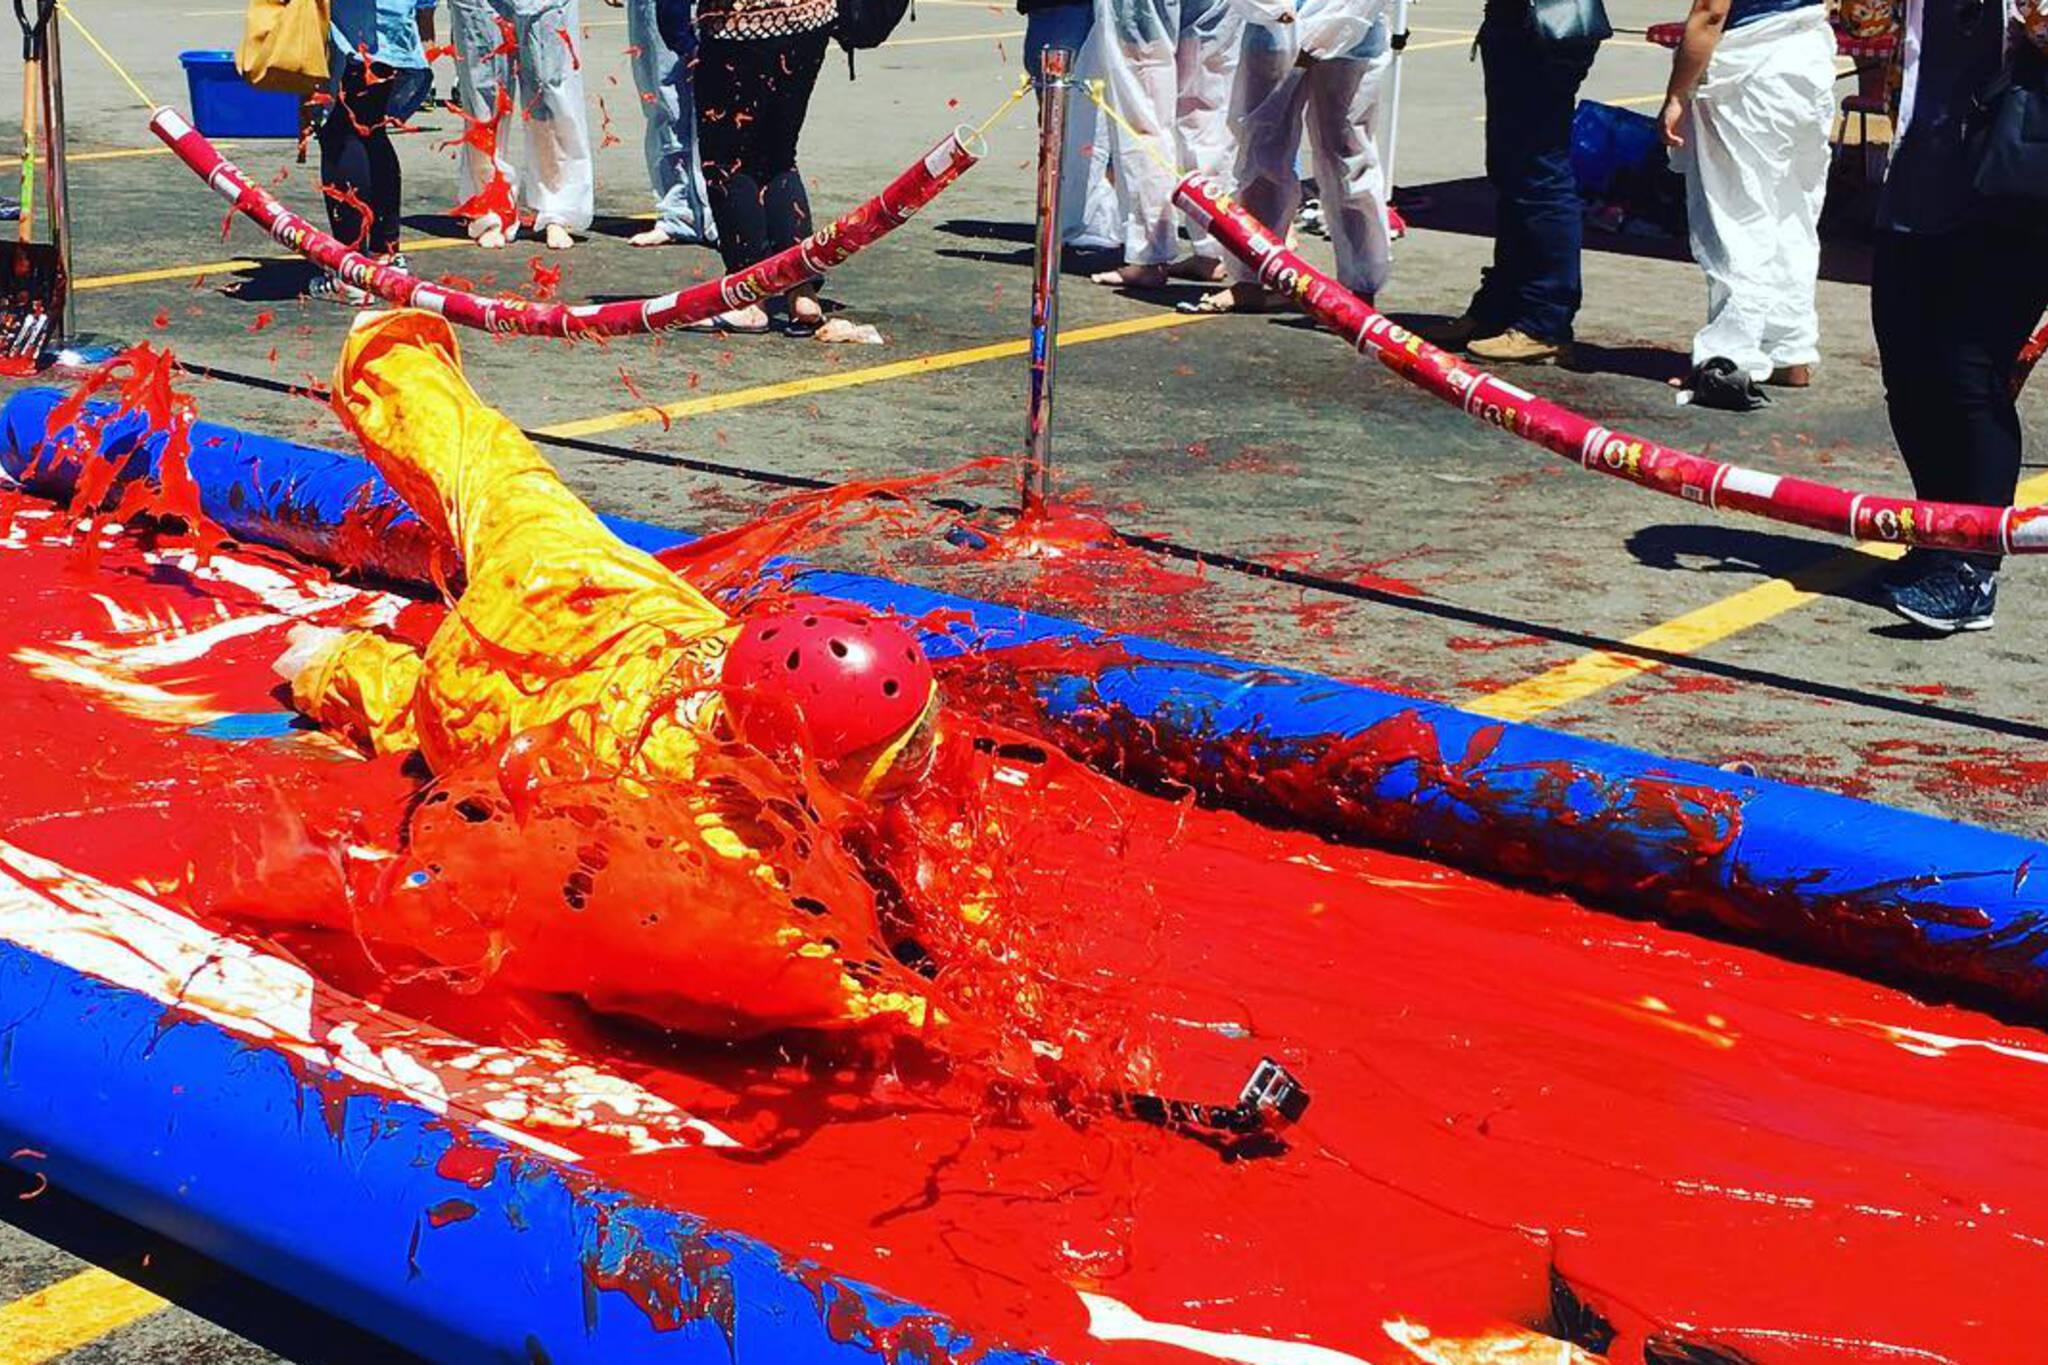 ketchup slip n slide toronto